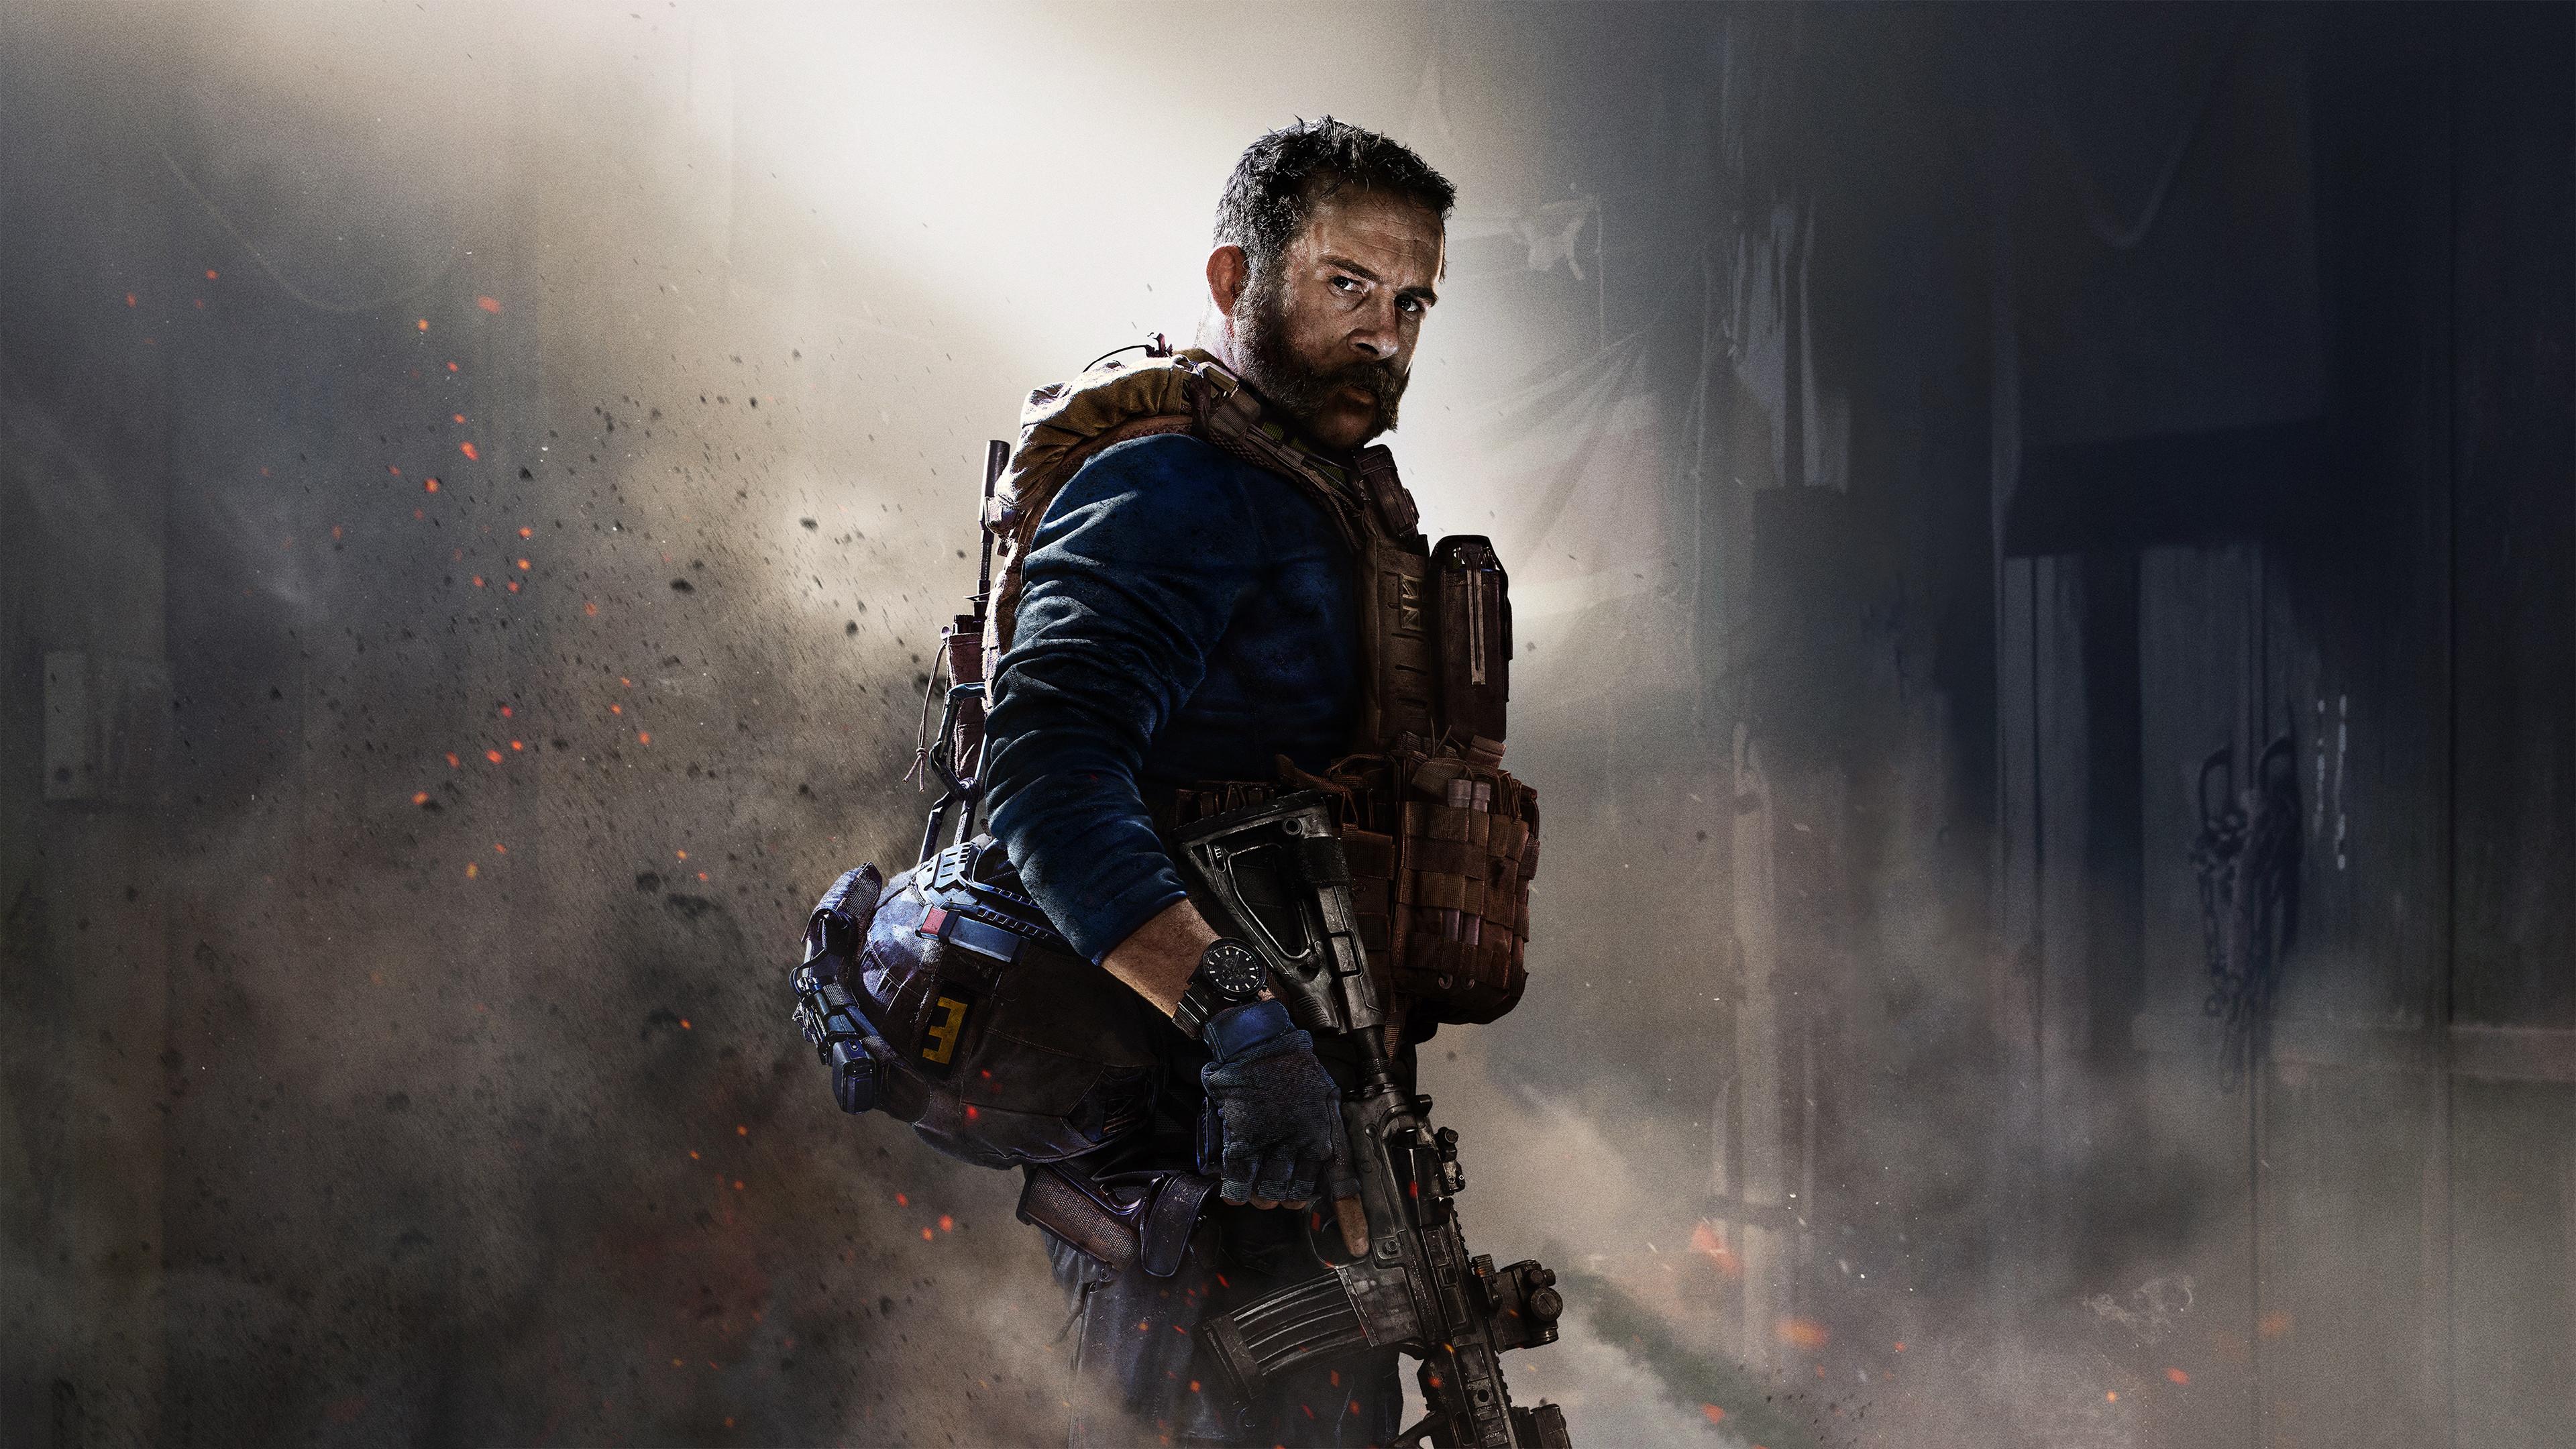 call of duty modern warfare 2019 4k cb 3840x2160 1 - Call Of Duty Modern Warfare 2019 - cod modern warfare 4k wallpaper, Call Of Duty Modern Warfare 2019 4k wallpaper